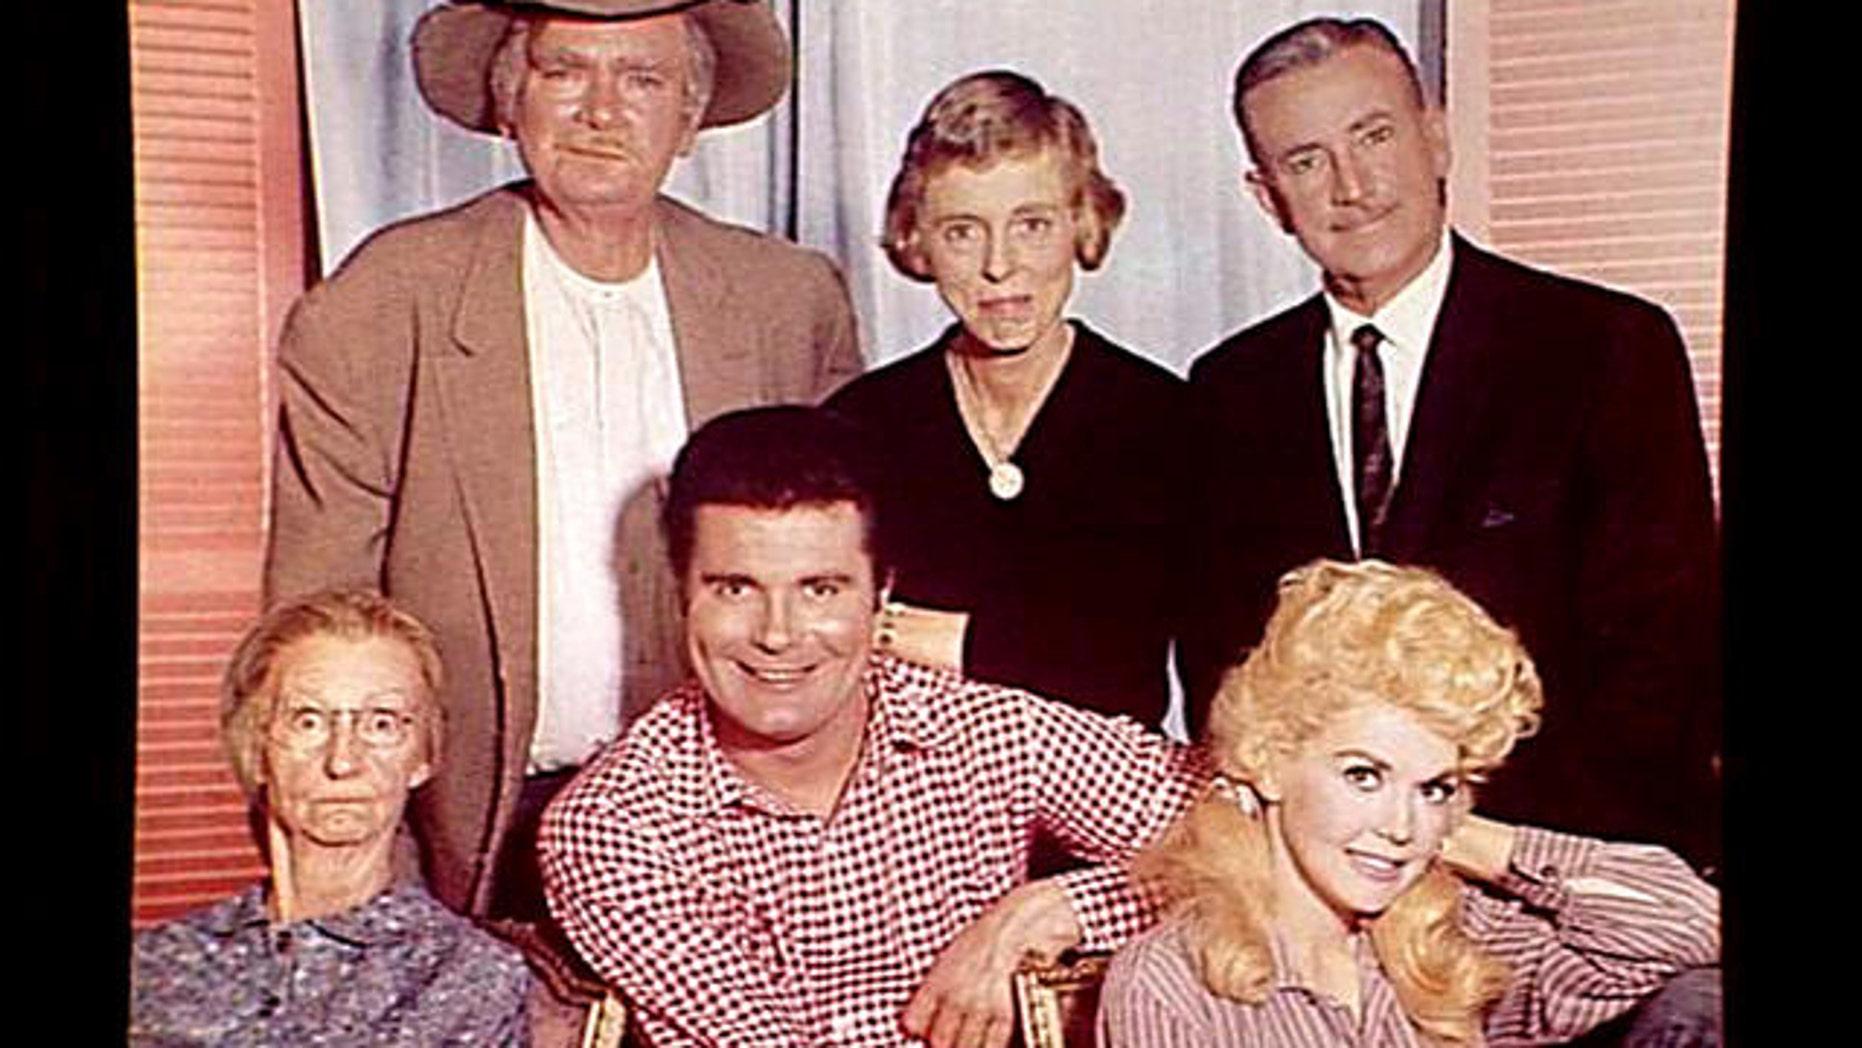 """The Beverly Hillbillies"" cast (l-r): Irene Ryan, Buddy Ebsen, Max Baer, Nancy Kulp, Raymond Bailey and Donna Douglas"